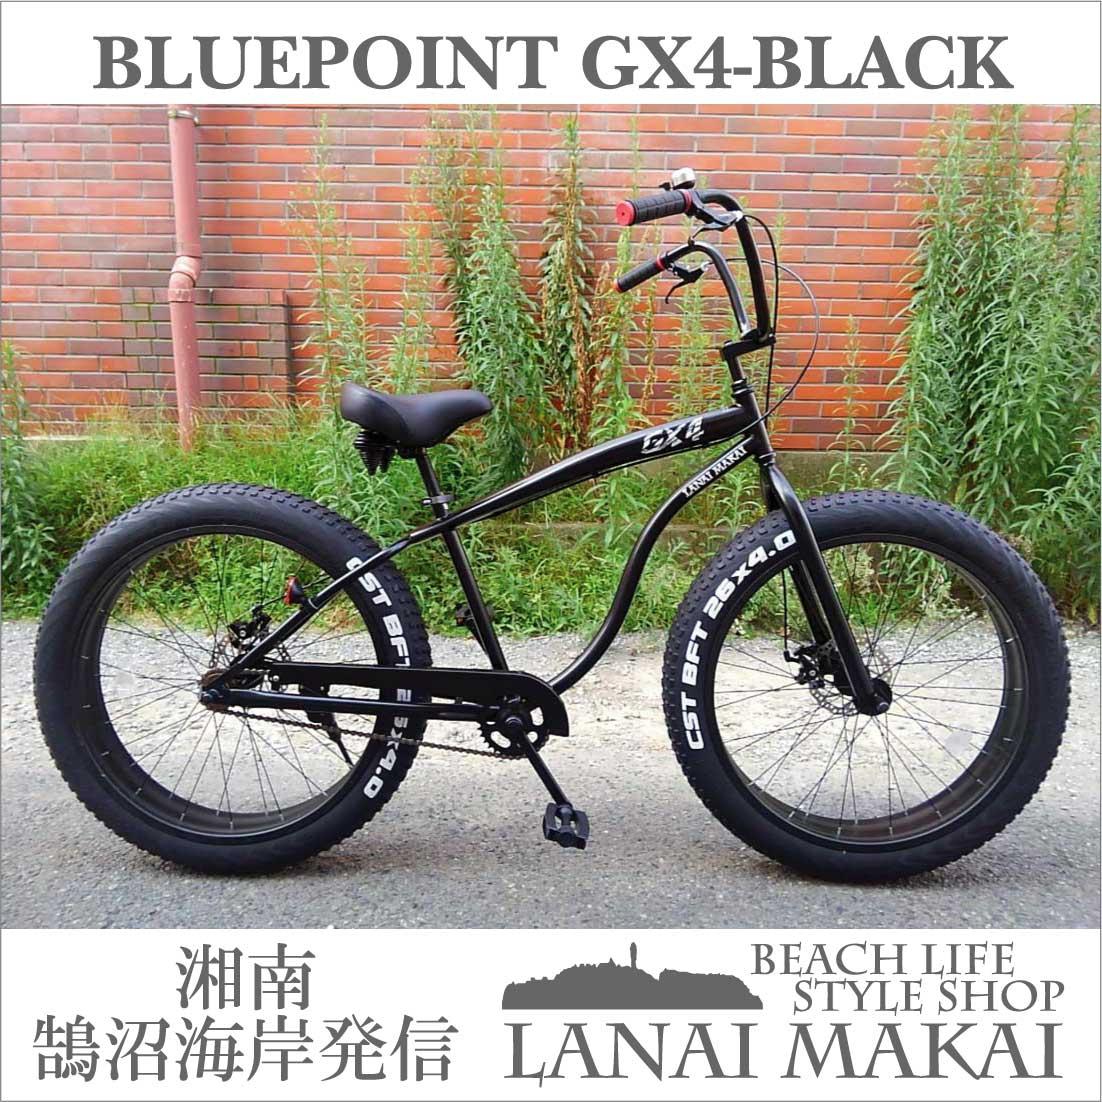 "【BLUEPOINT】""GX4-BeachCruiser-FATBIKE""color:ブラック湘南鵠沼海岸発信26インチビーチクルーザーファットバイク自転車 ファットバイク ビーチクルーザー 極太"